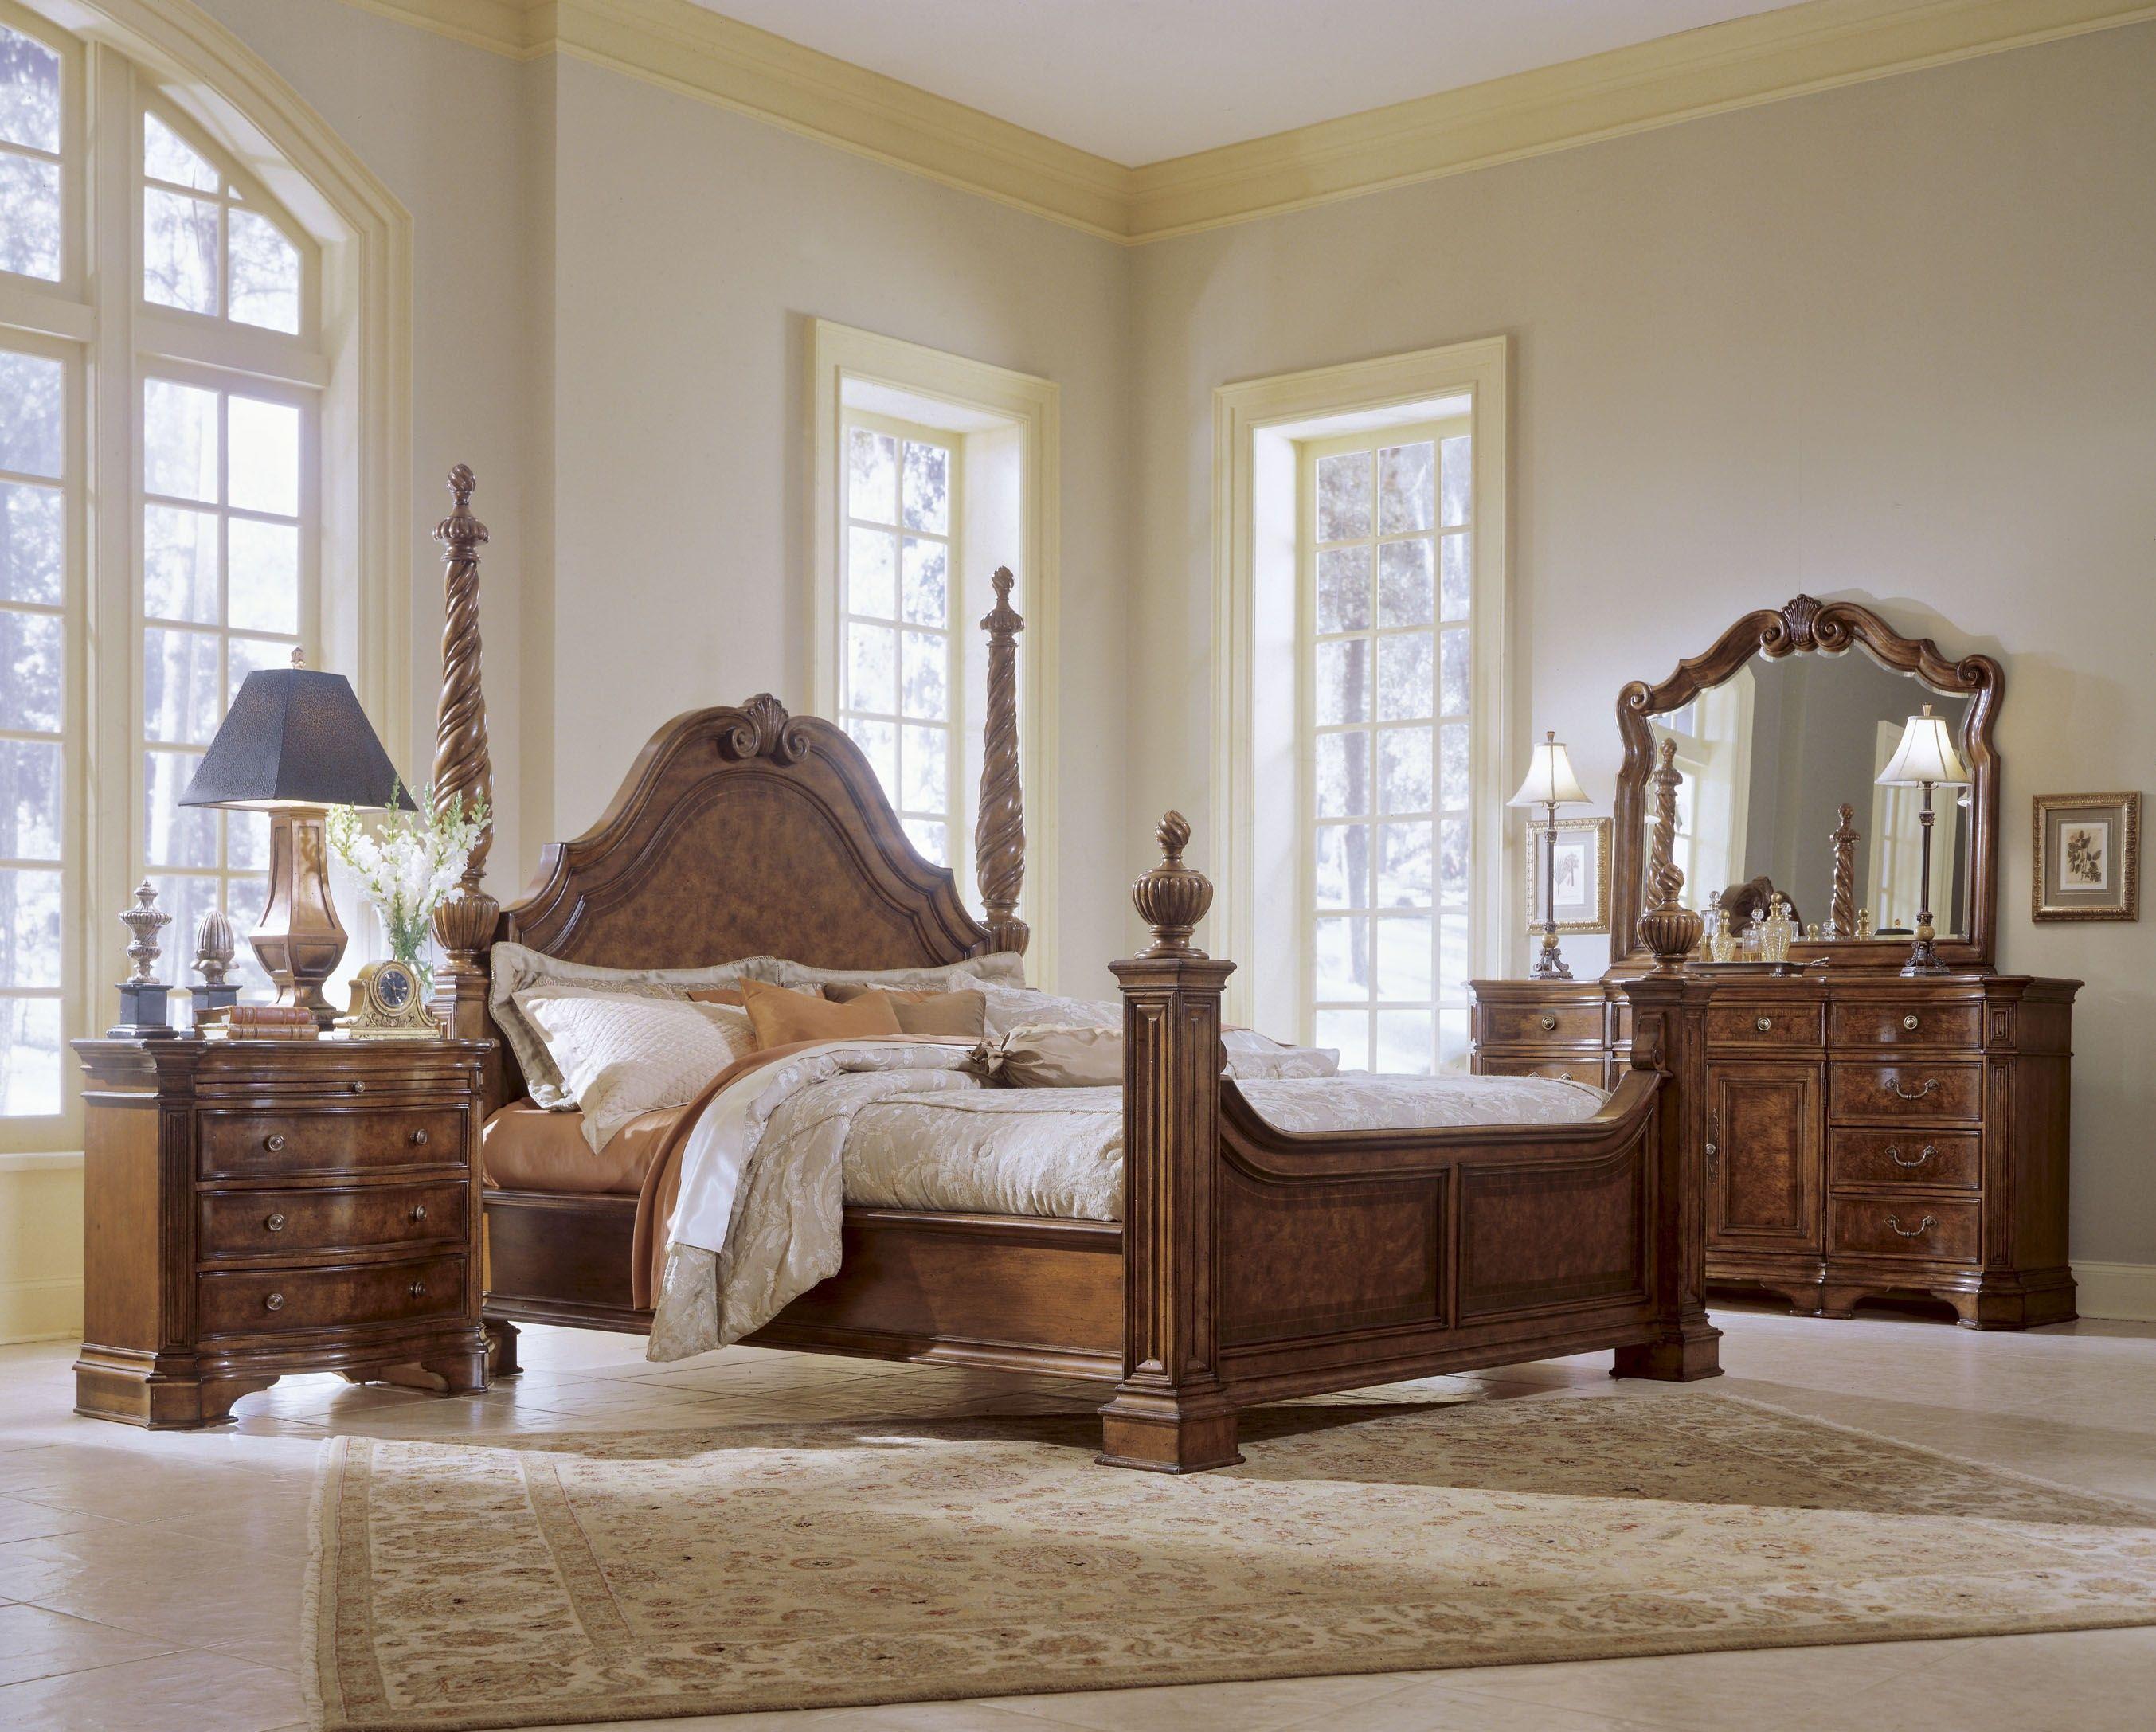 Universal Furniture Villa Cortina Bedroom Collection  Bedroom set